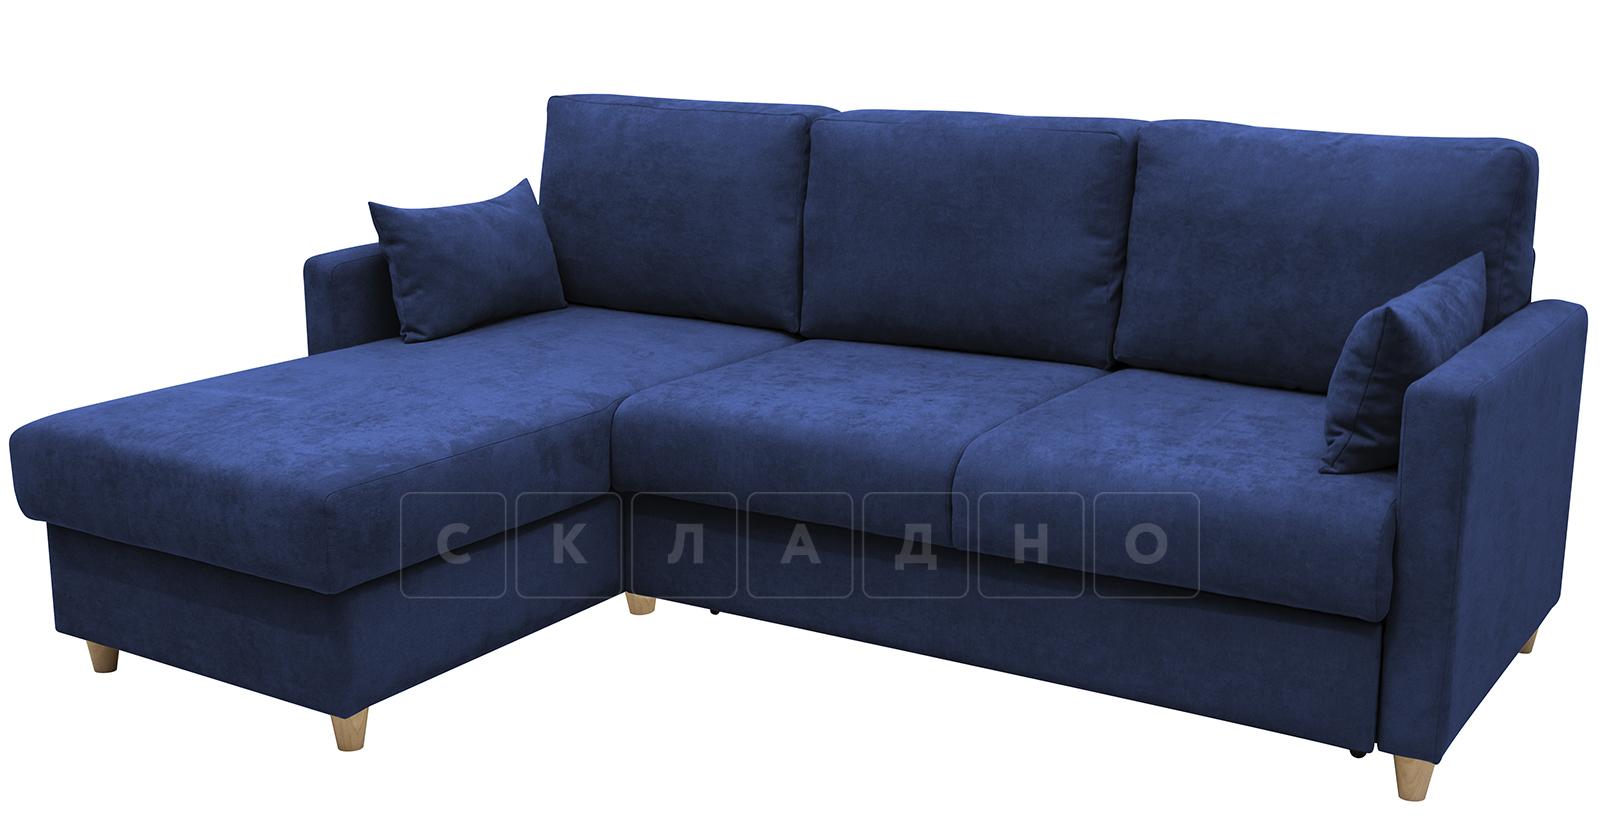 Угловой диван Дарвин темно-синий фото 2 | интернет-магазин Складно